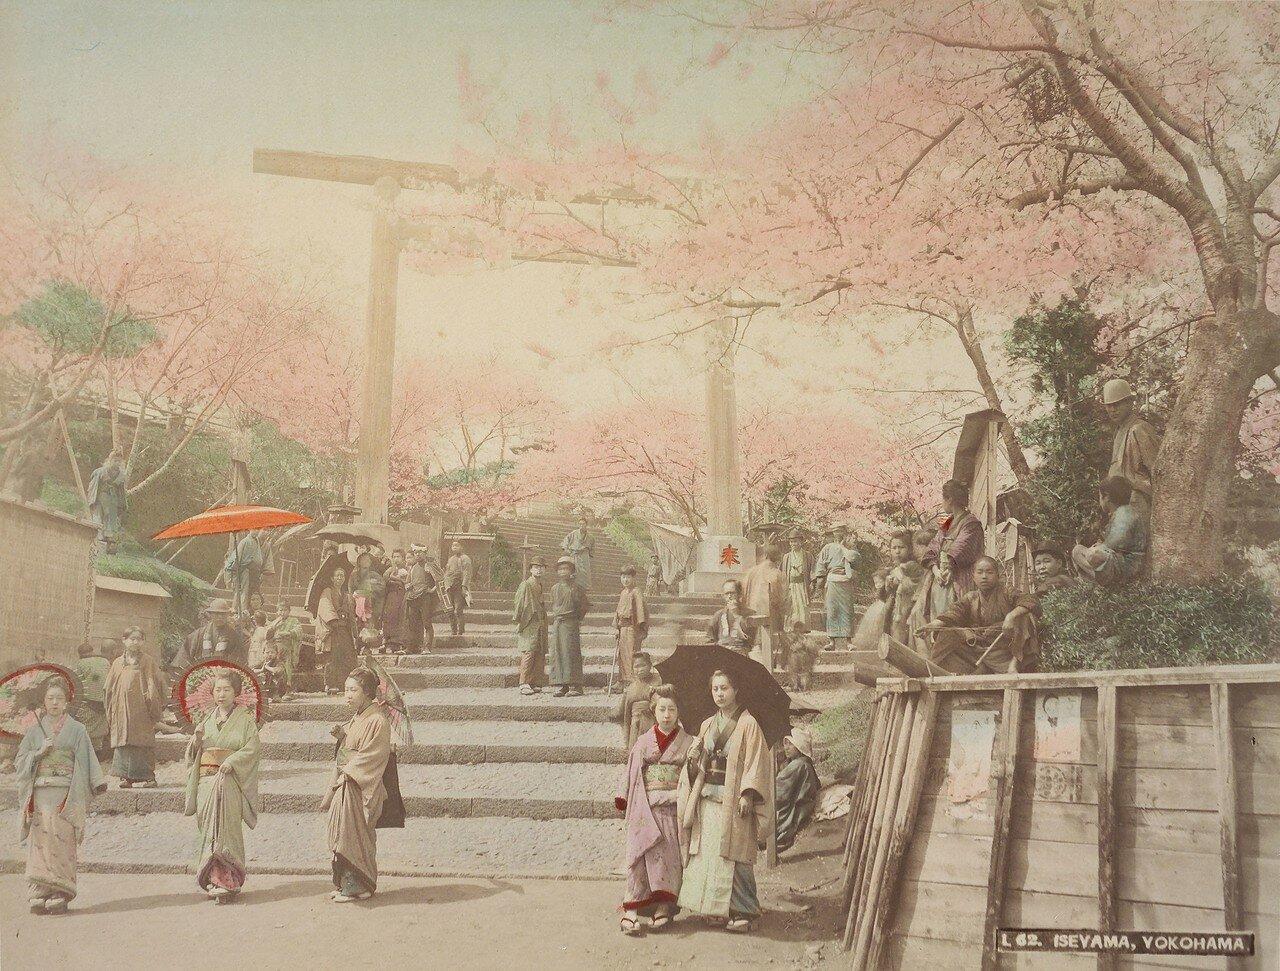 Иокогама.  Храм-монастырь Исияма Хонгандзи